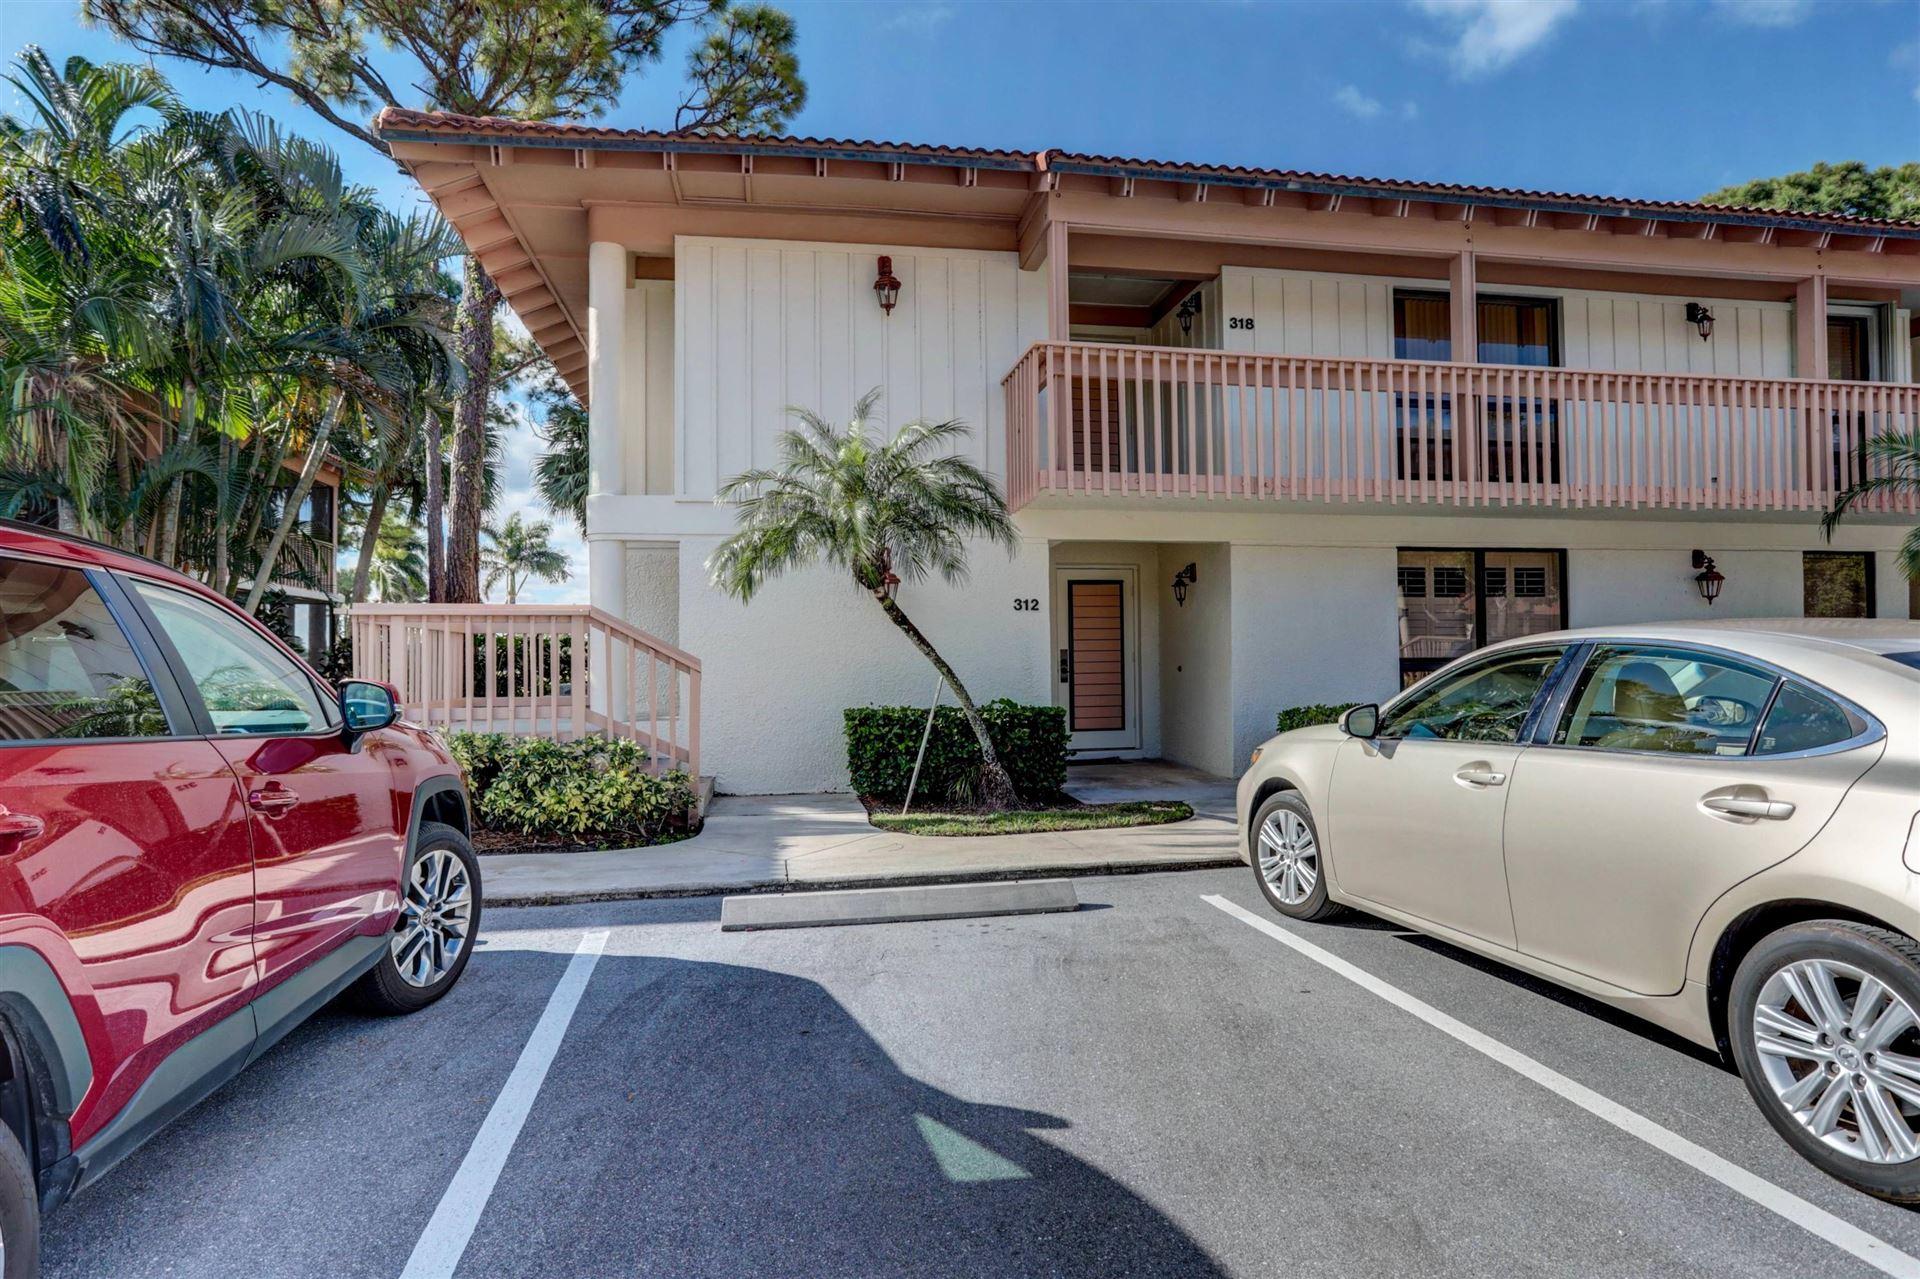 Photo of 318 Brackenwood Circle, Palm Beach Gardens, FL 33418 (MLS # RX-10675616)